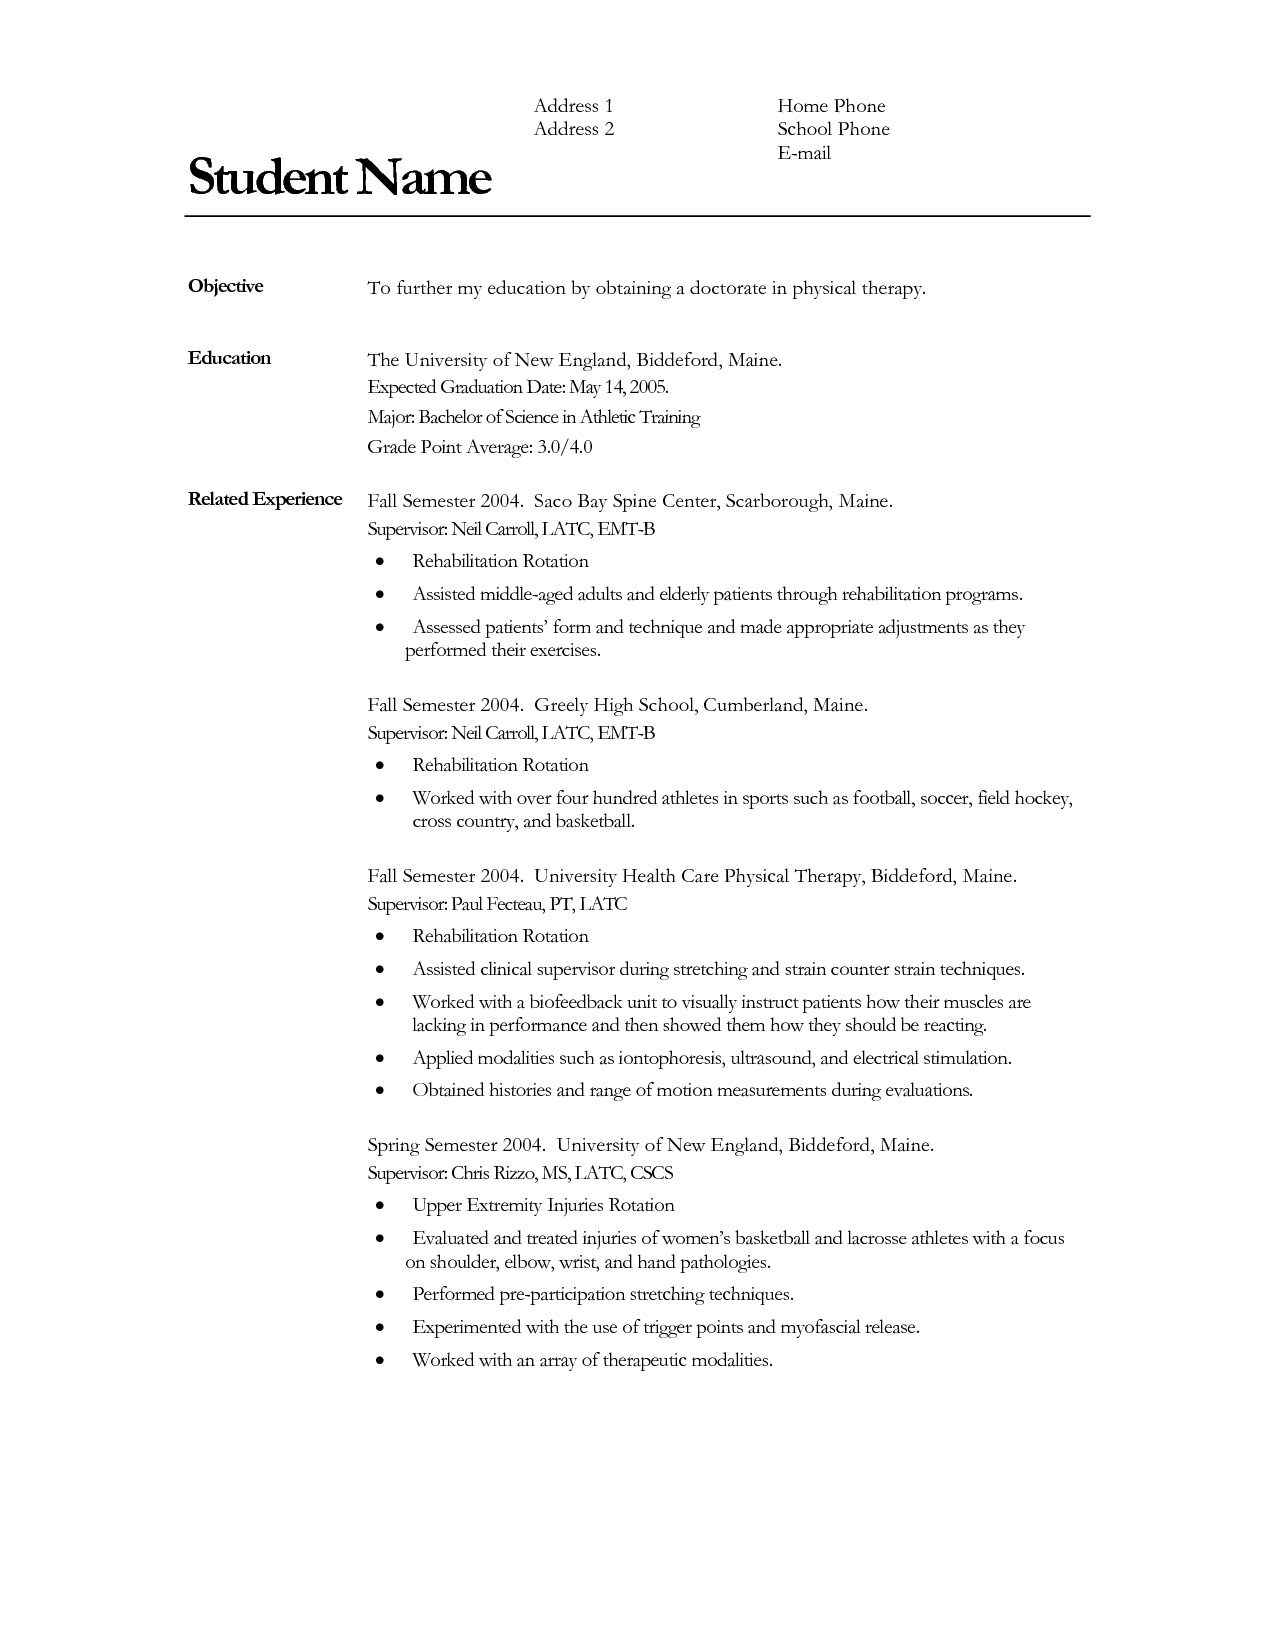 Resume Graduation Dates Listed The Best Estimate Professional